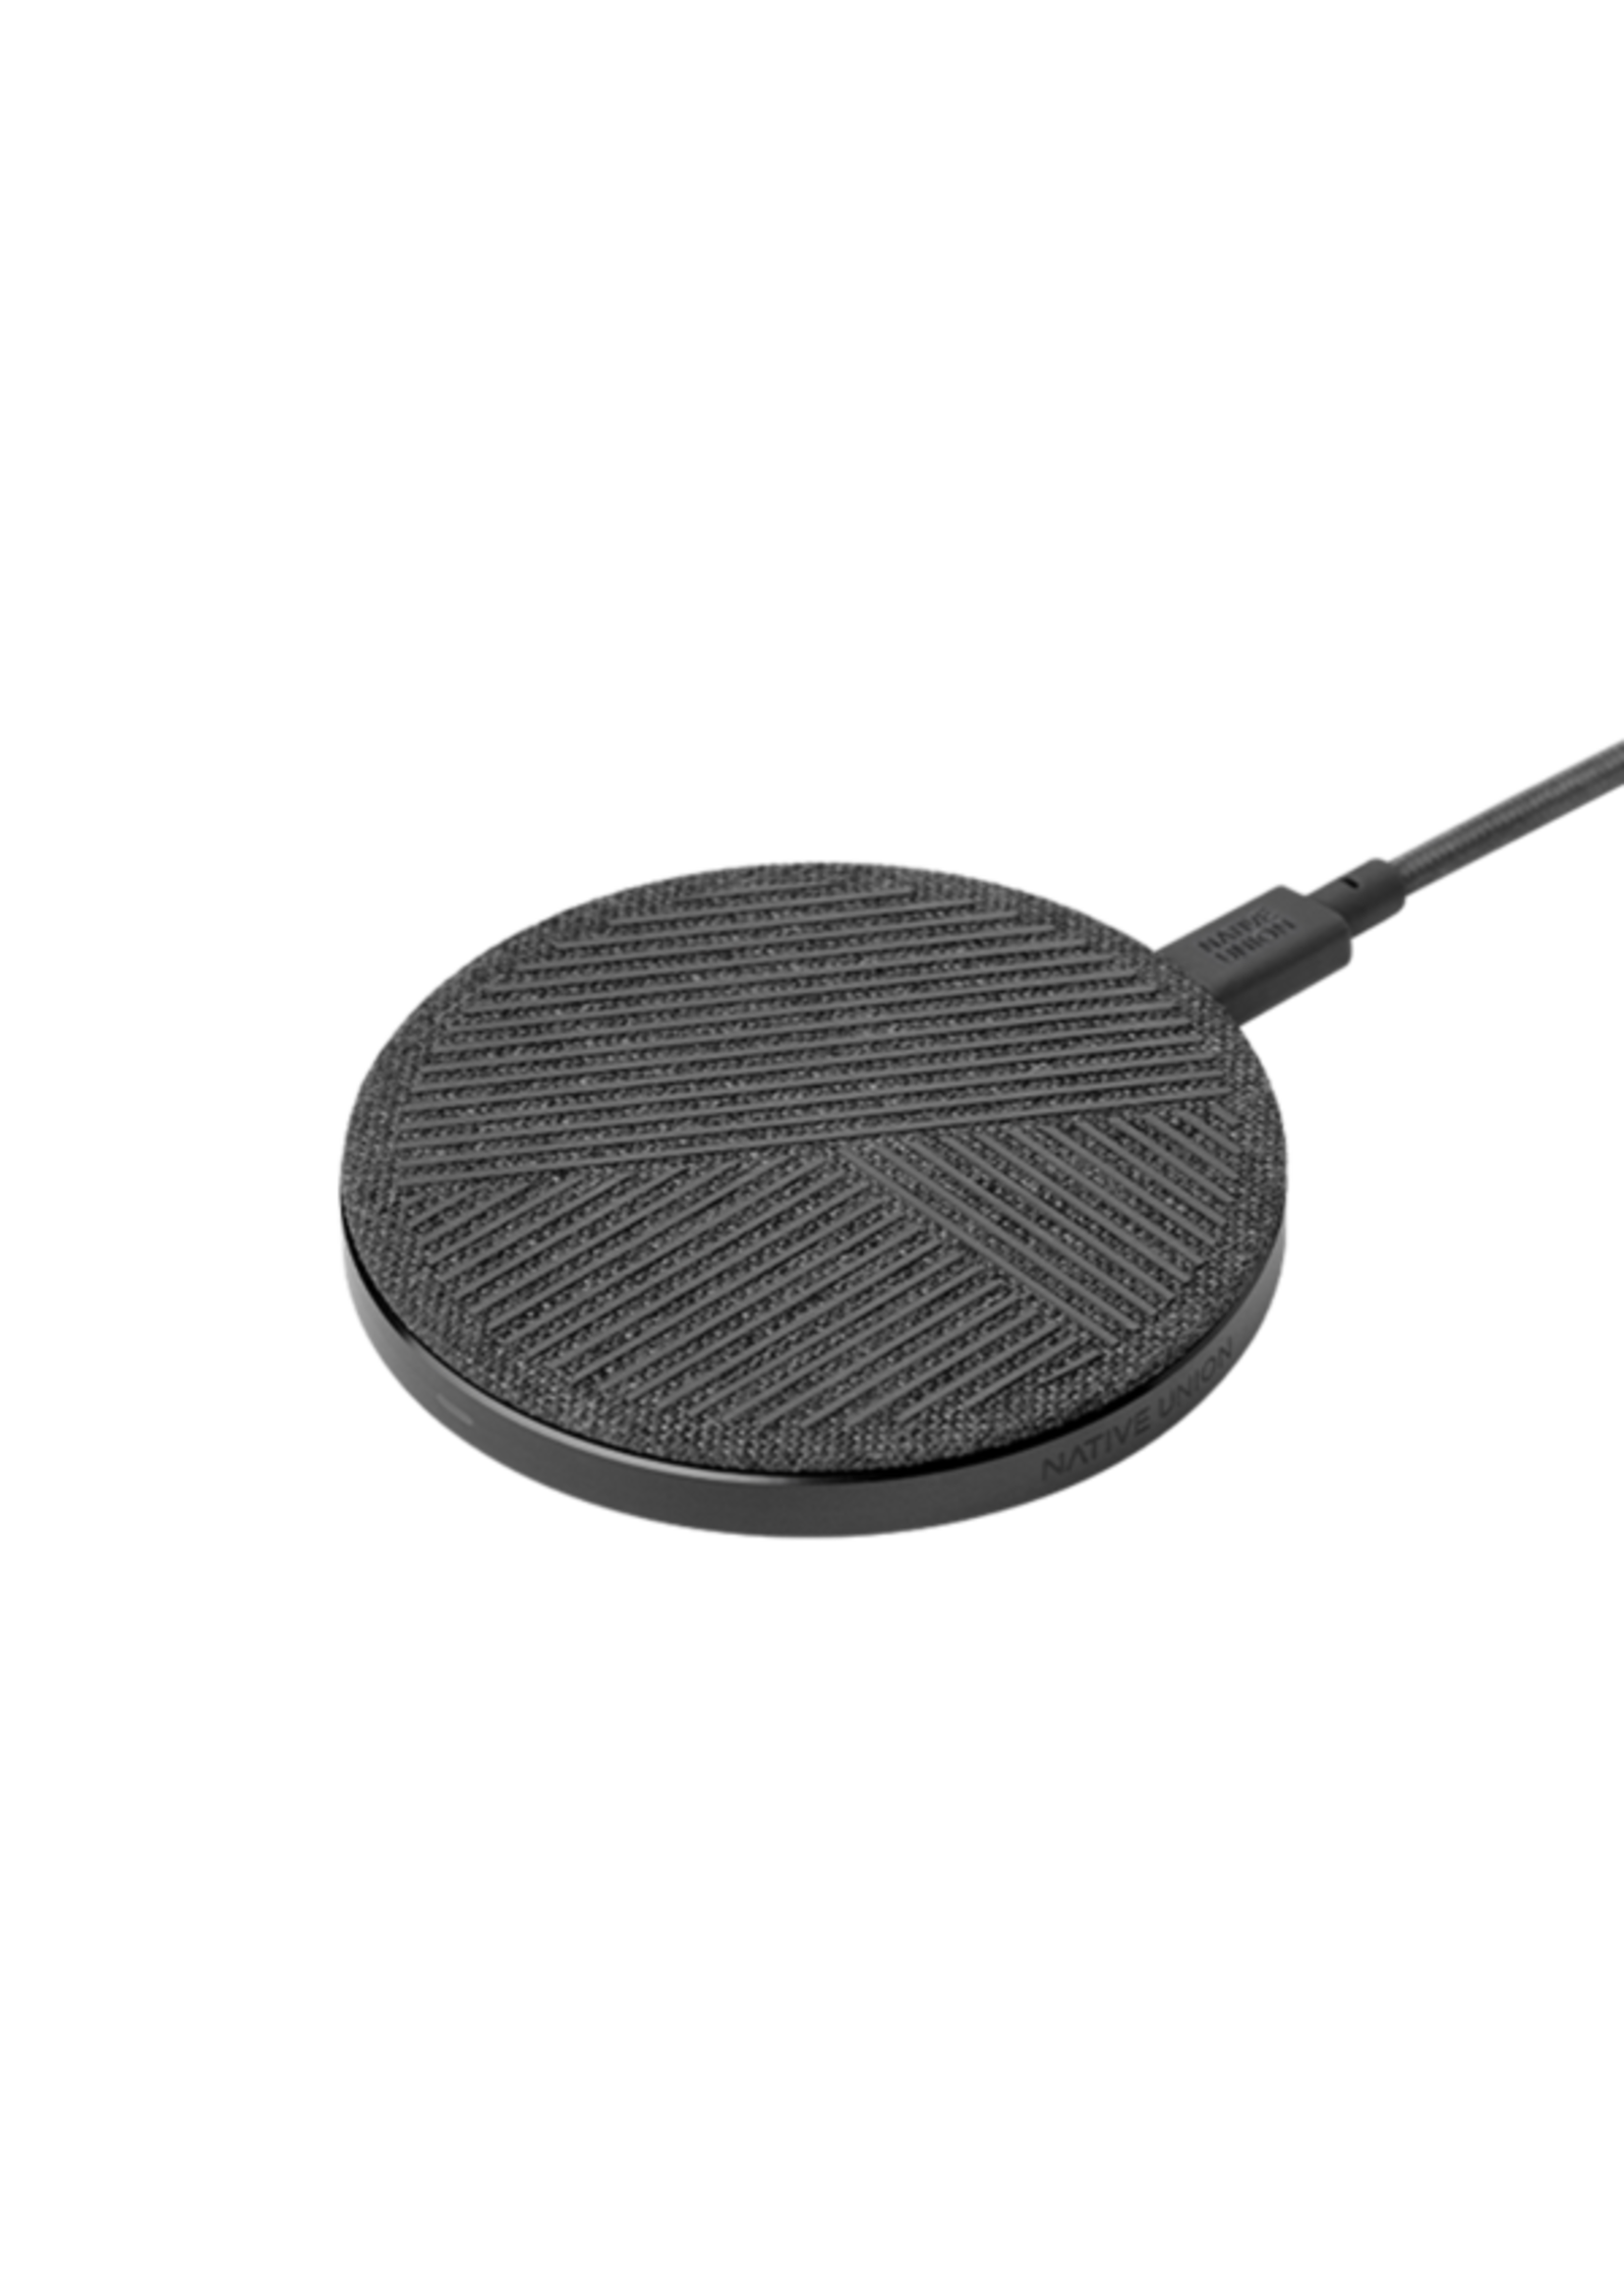 Native Union Native Union Drop Wireless Charger - Black